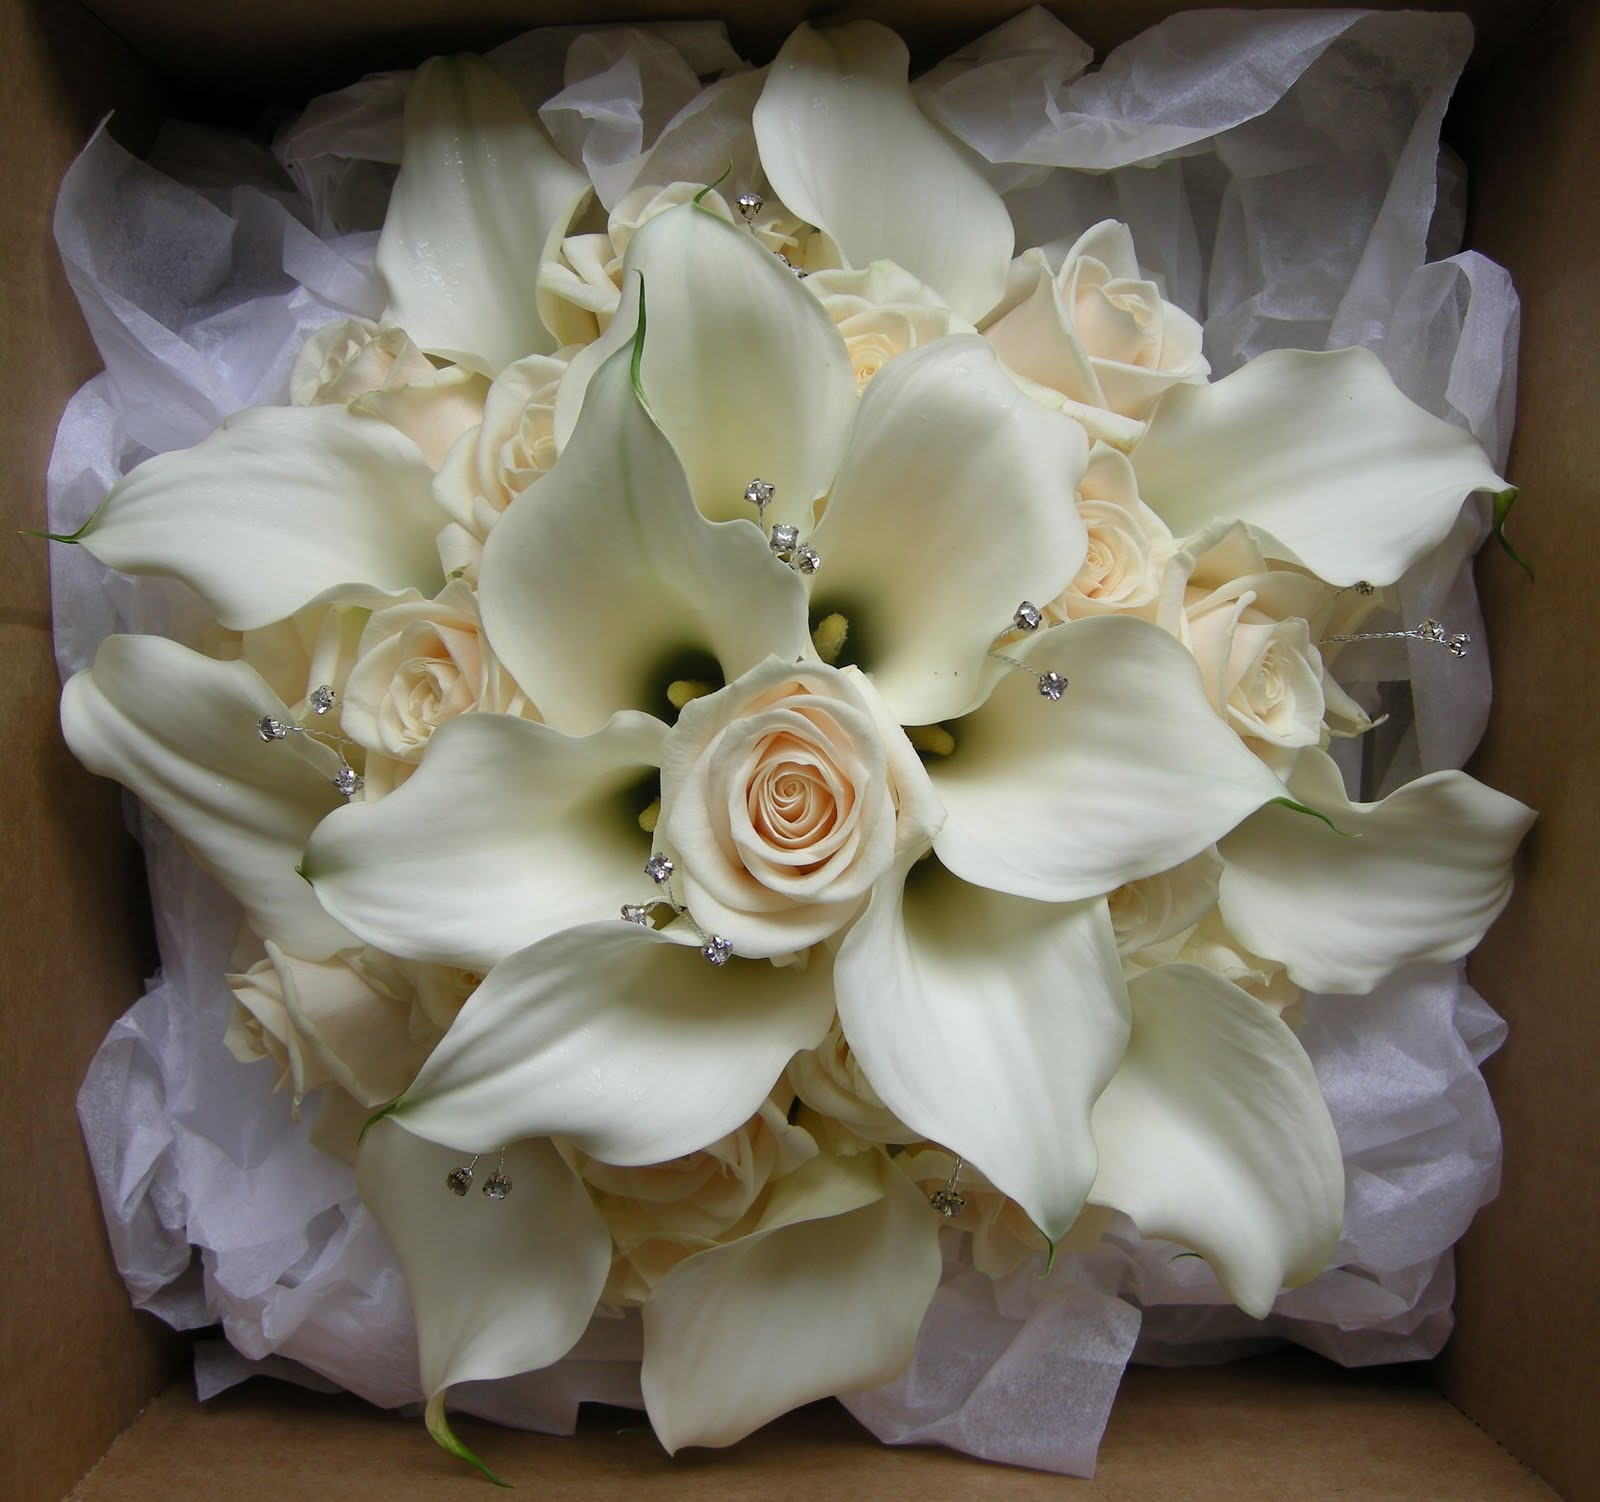 calla lily rose wedding bouquets photo - 1